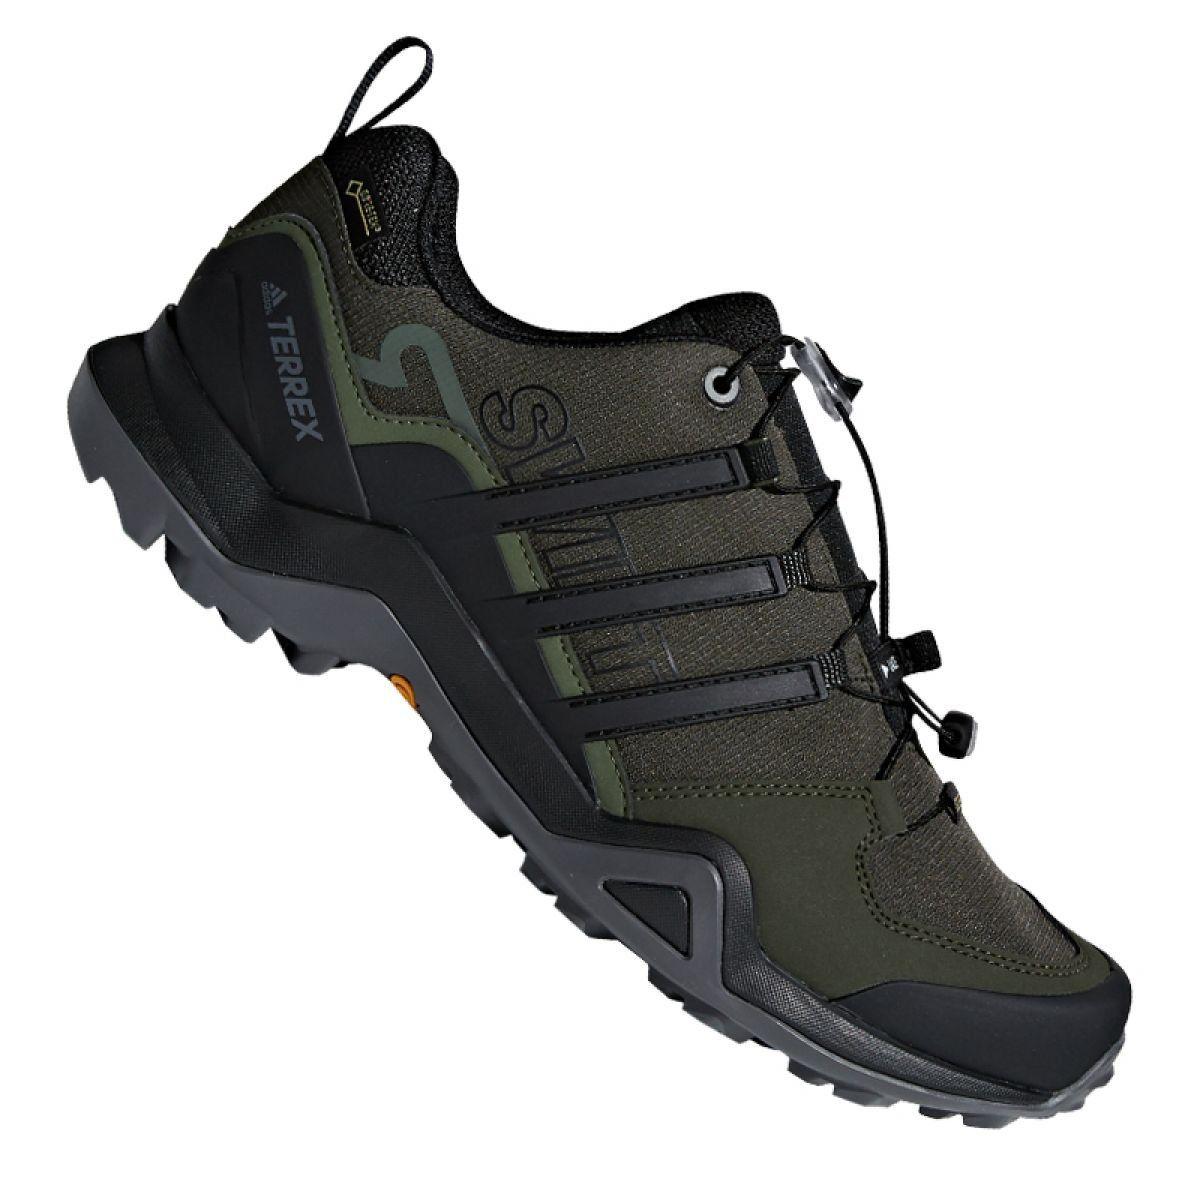 Buty Adidas Terrex Swift R2 Gtx M Zielone Sports Shoes Adidas Mens Hiking Boots Trekking Shoes